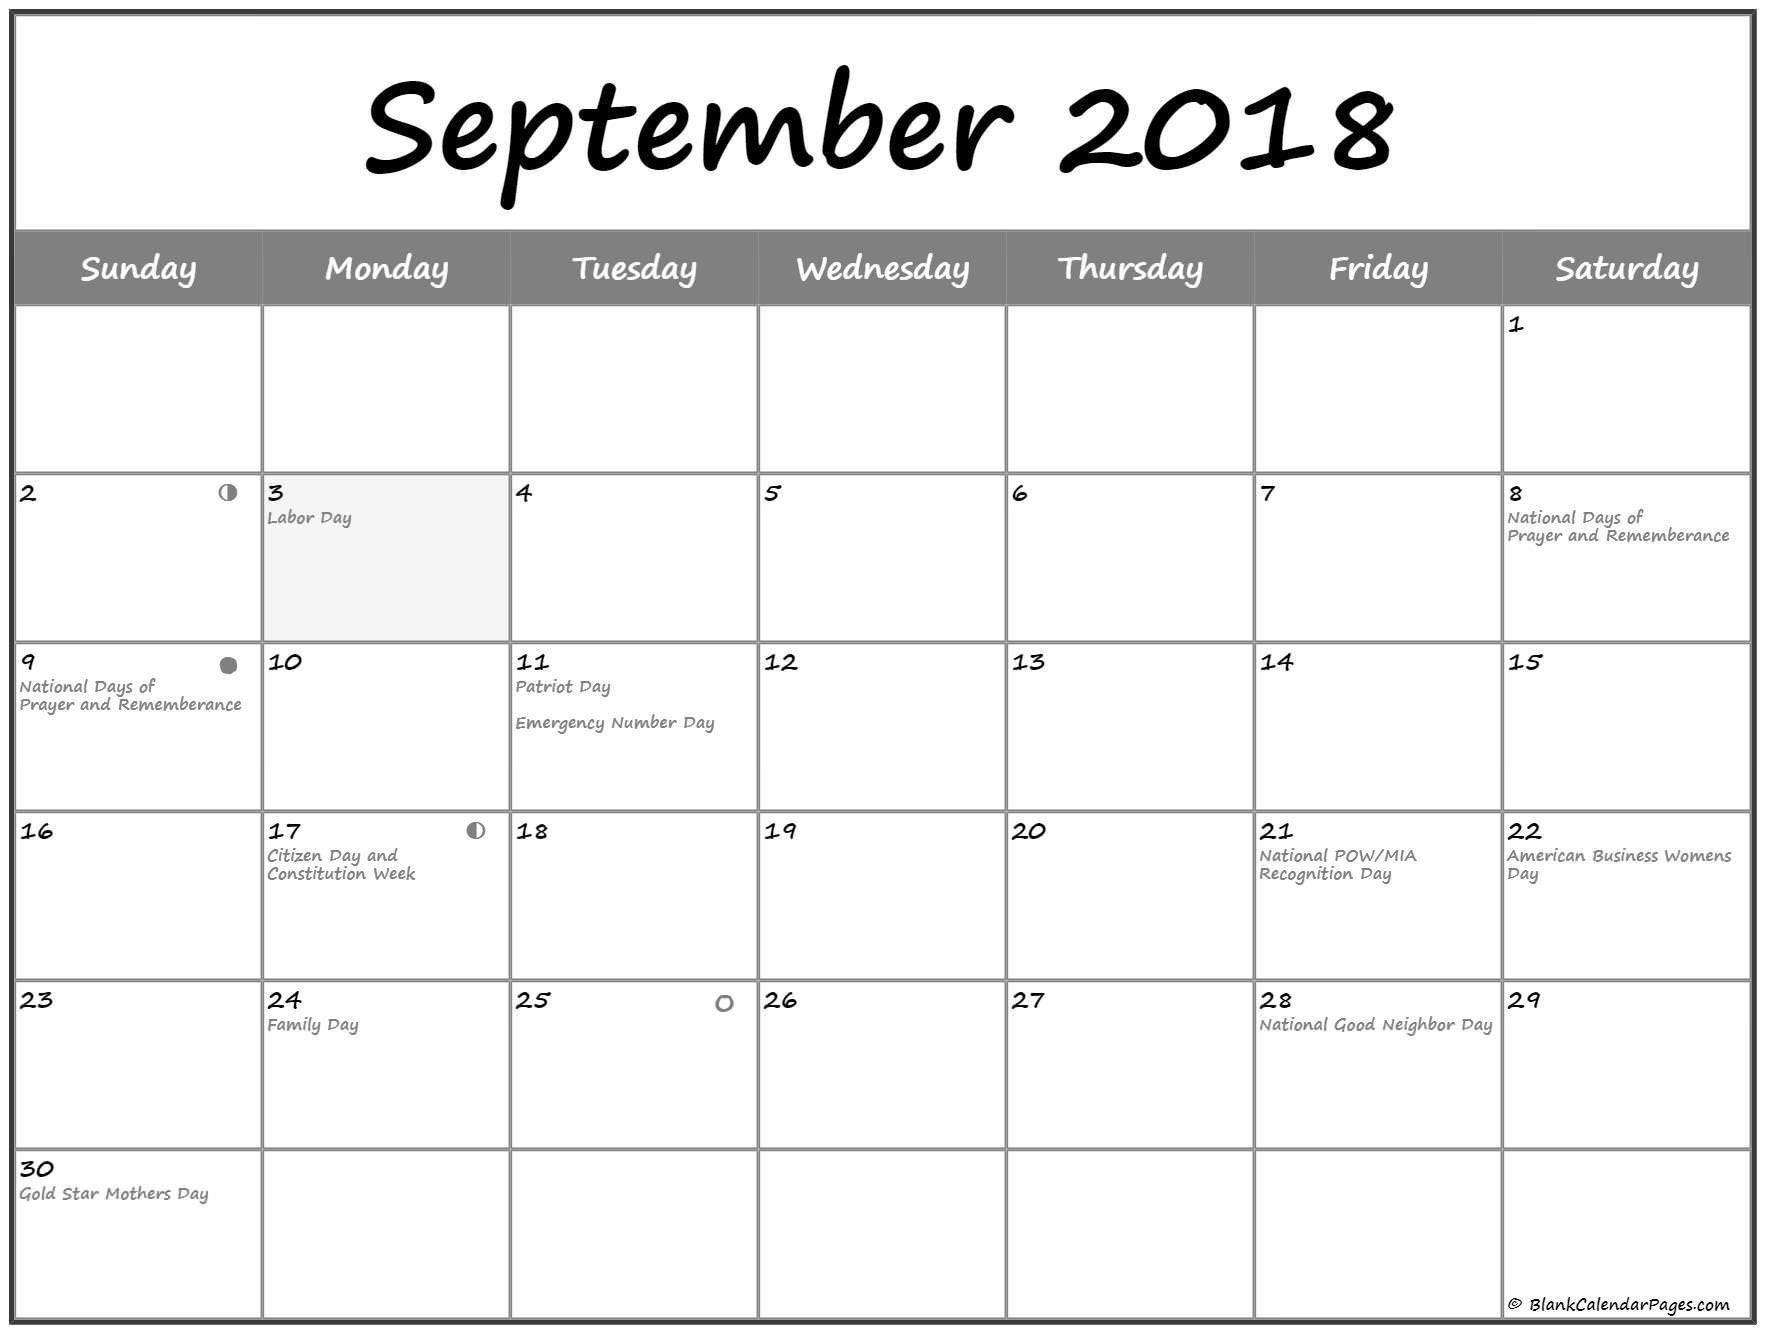 September 2018 Lunar Calendar. Moon Phase Calendar With